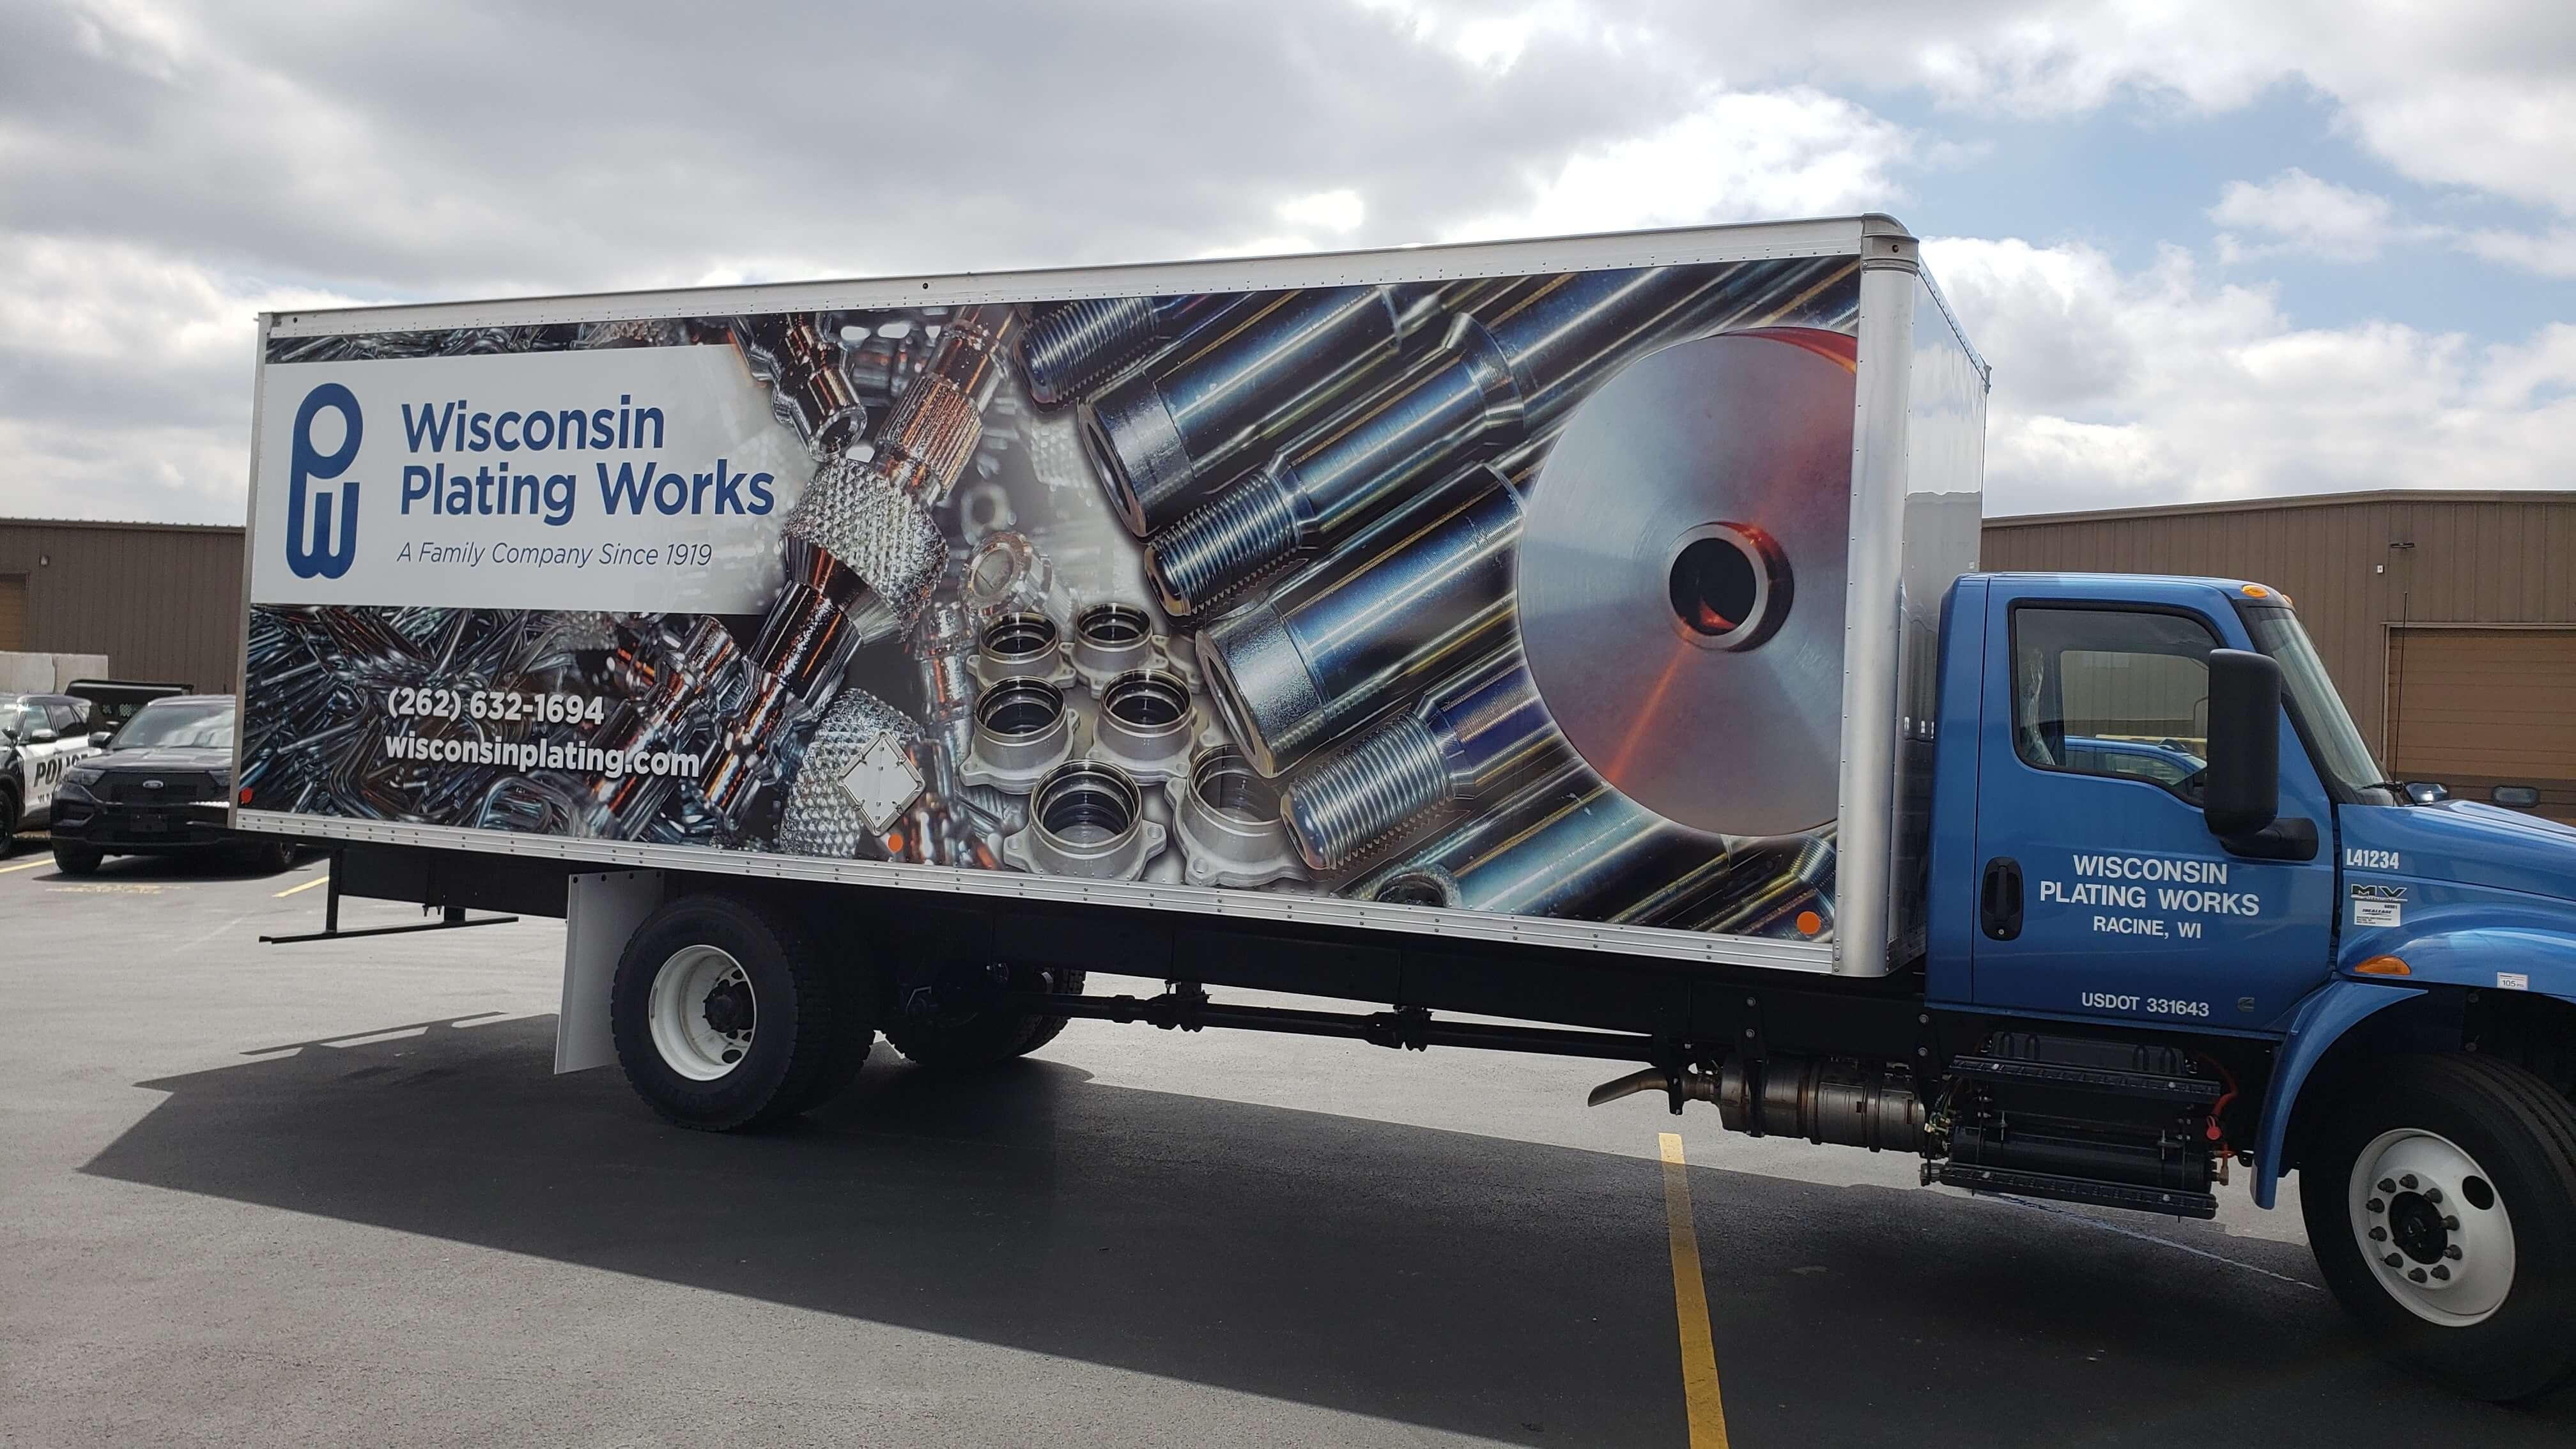 Wisconsin plating full vehicle wrap